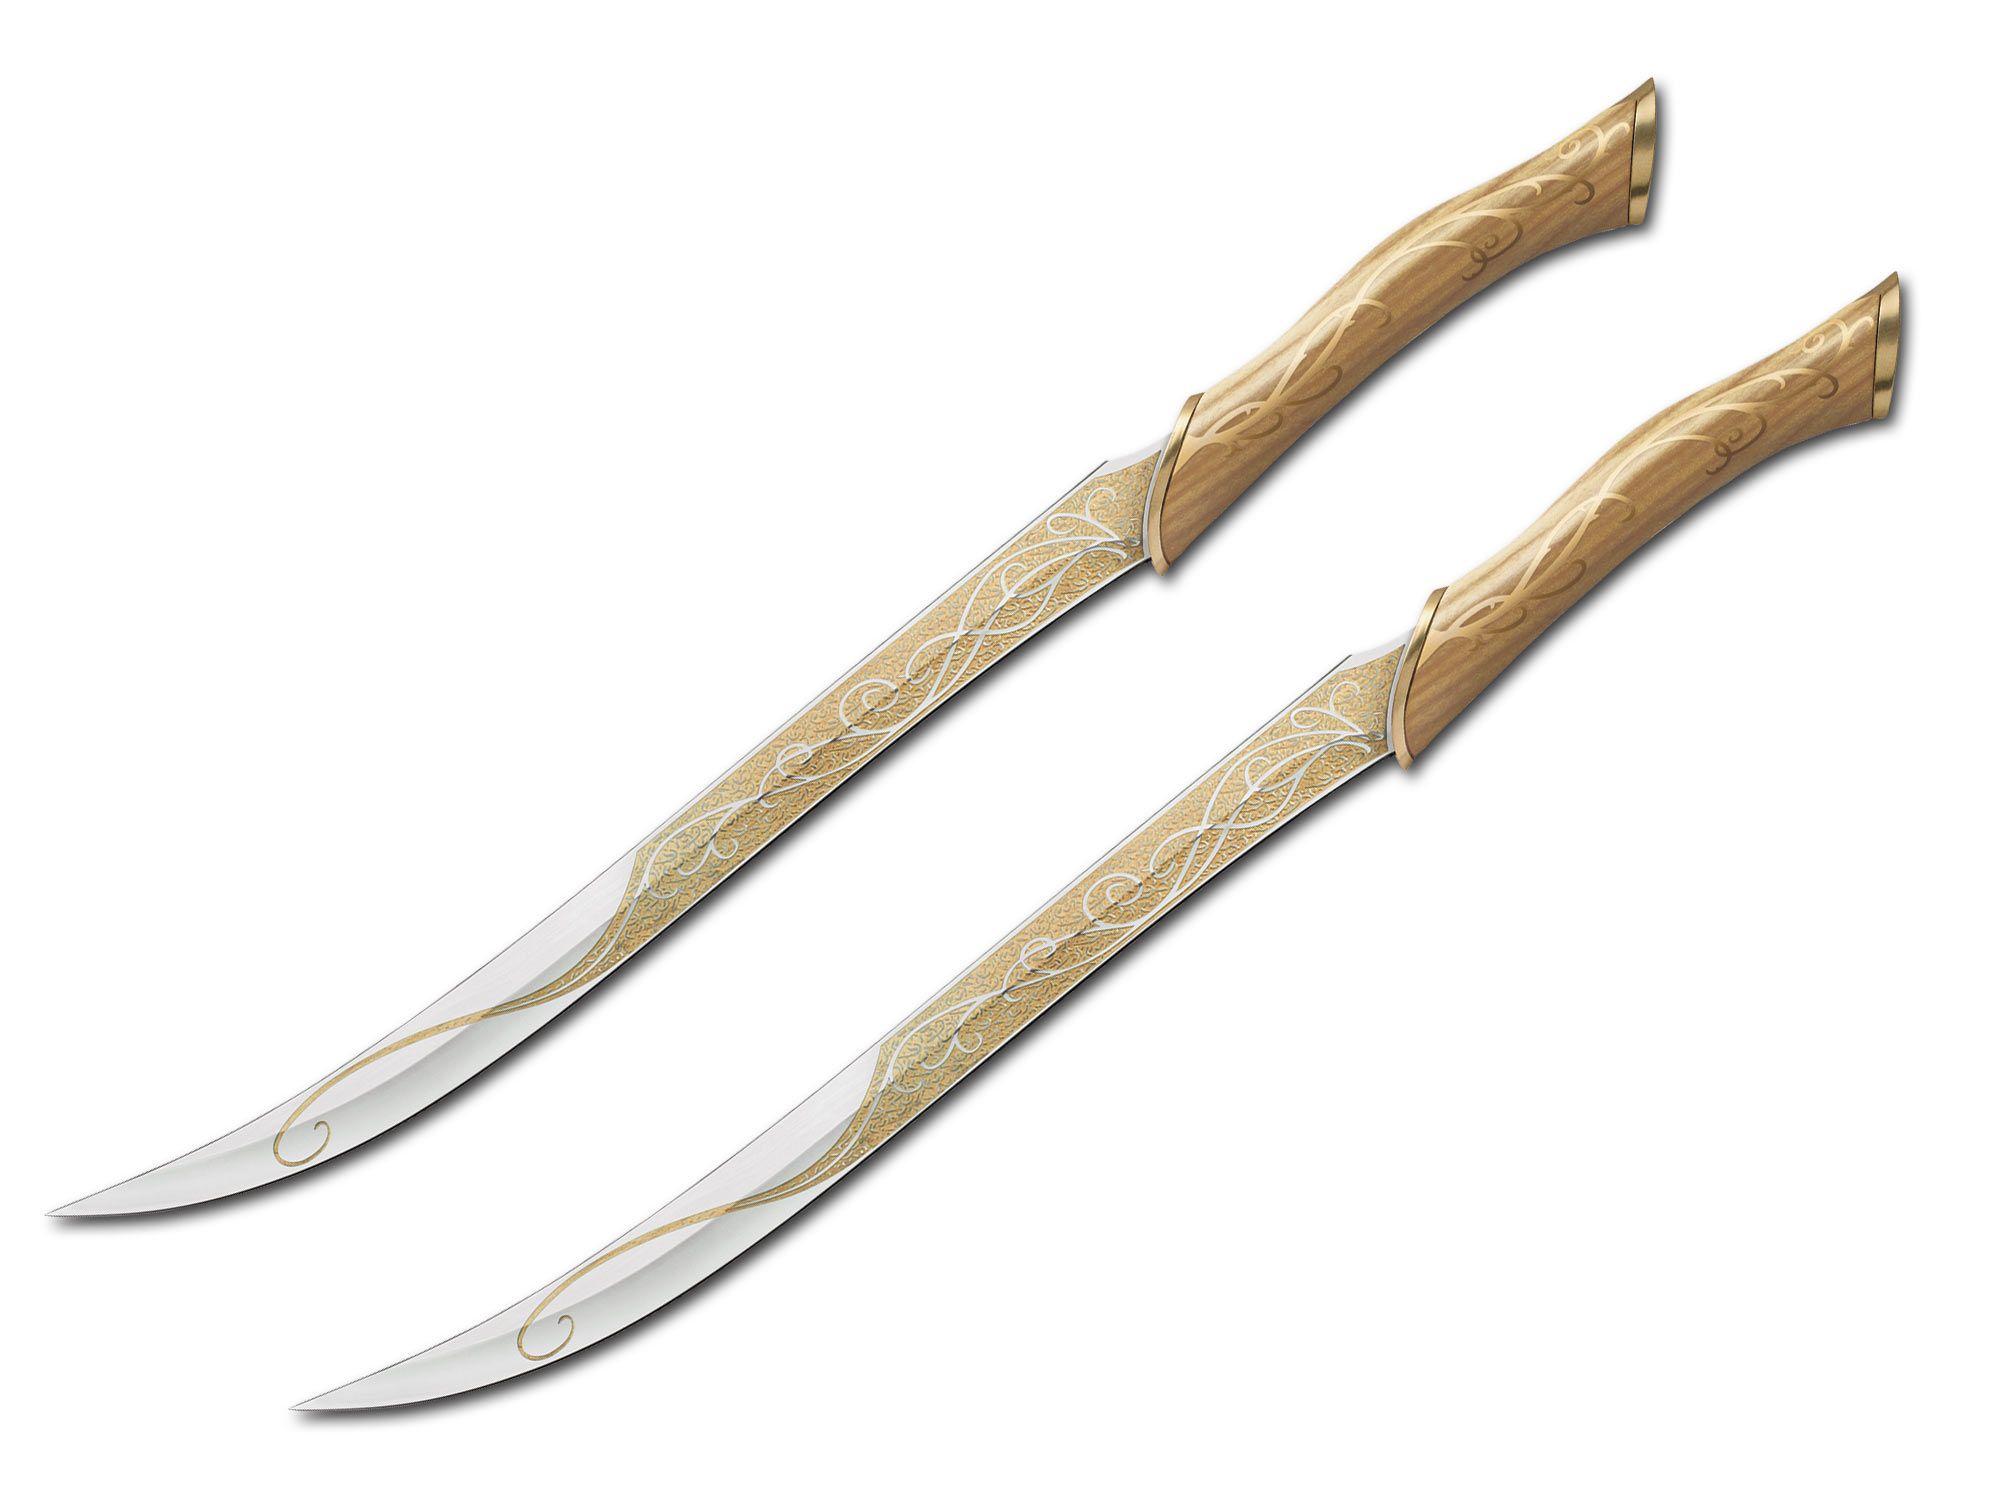 Hobbit United Cutlery The Hobbit: Legolas Dagger With ...